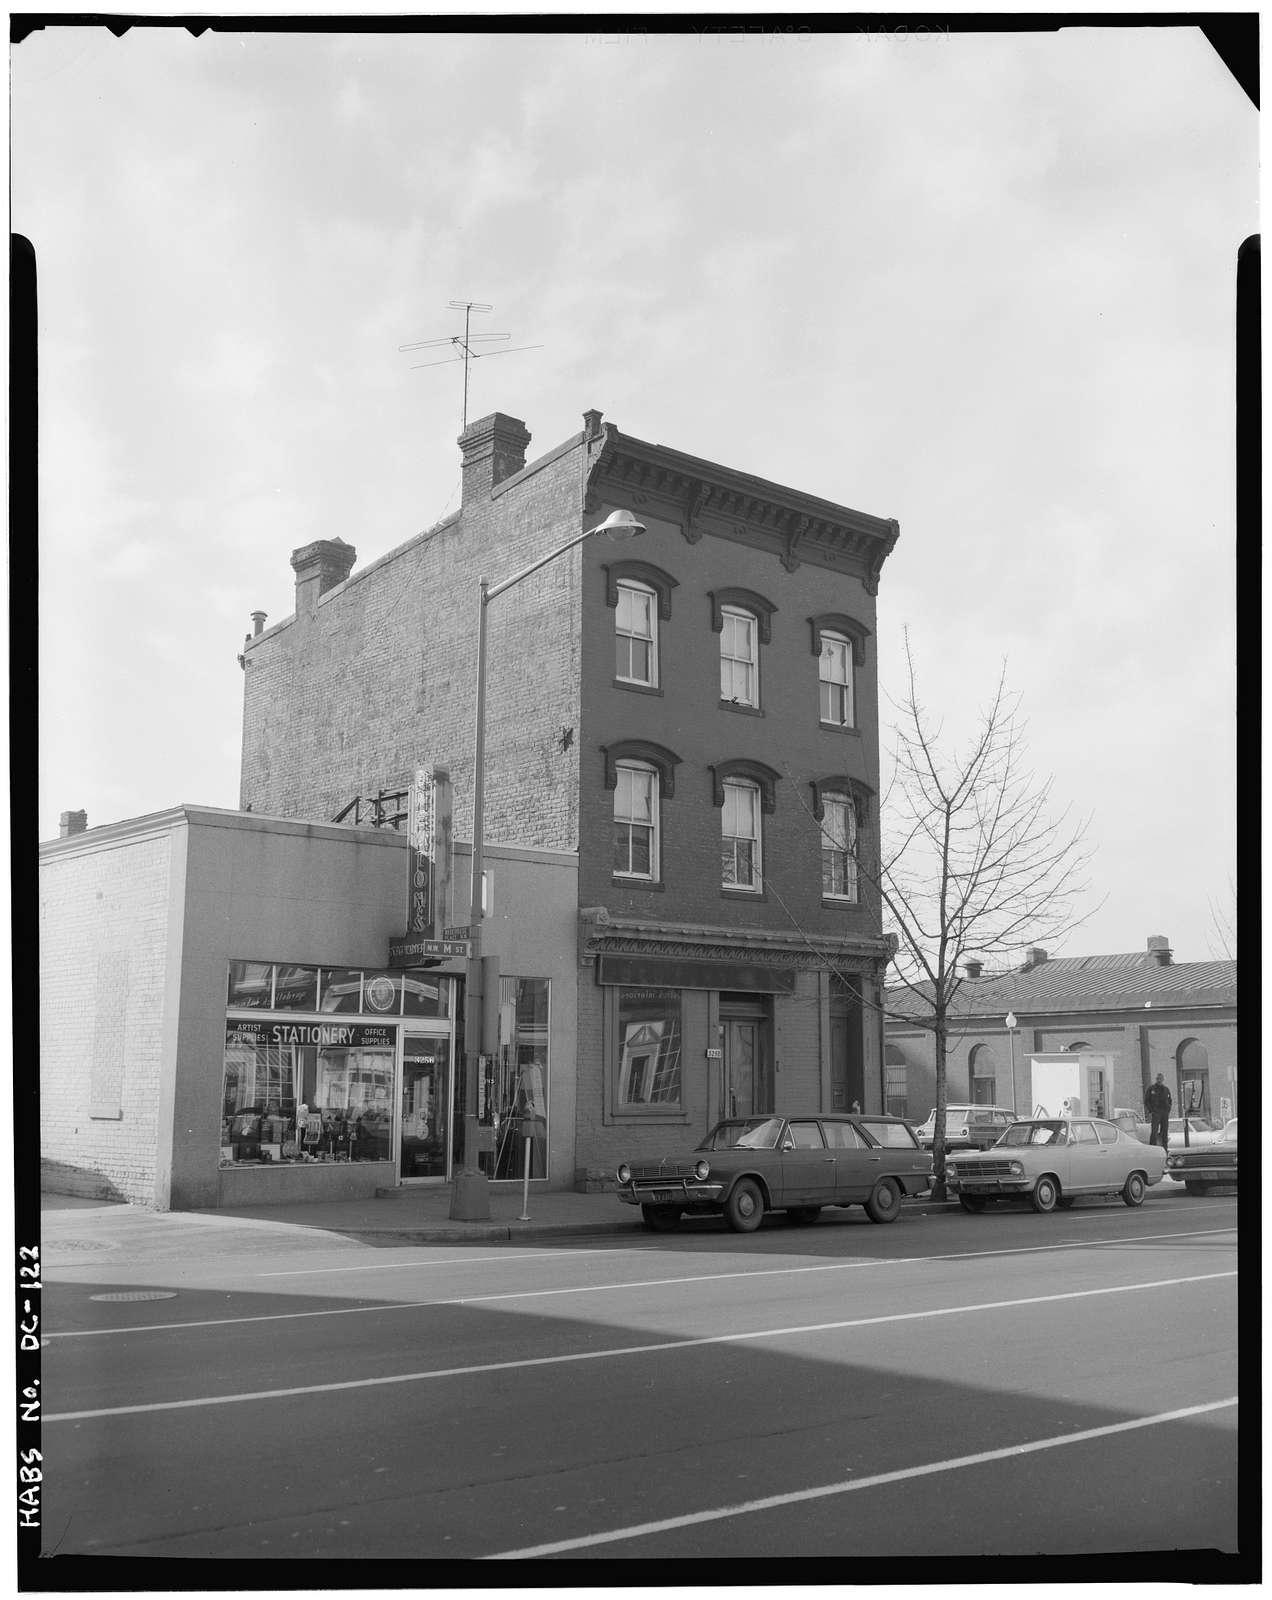 Anthony Reintzel Building, 3258 M Street Northwest, Washington, District of Columbia, DC